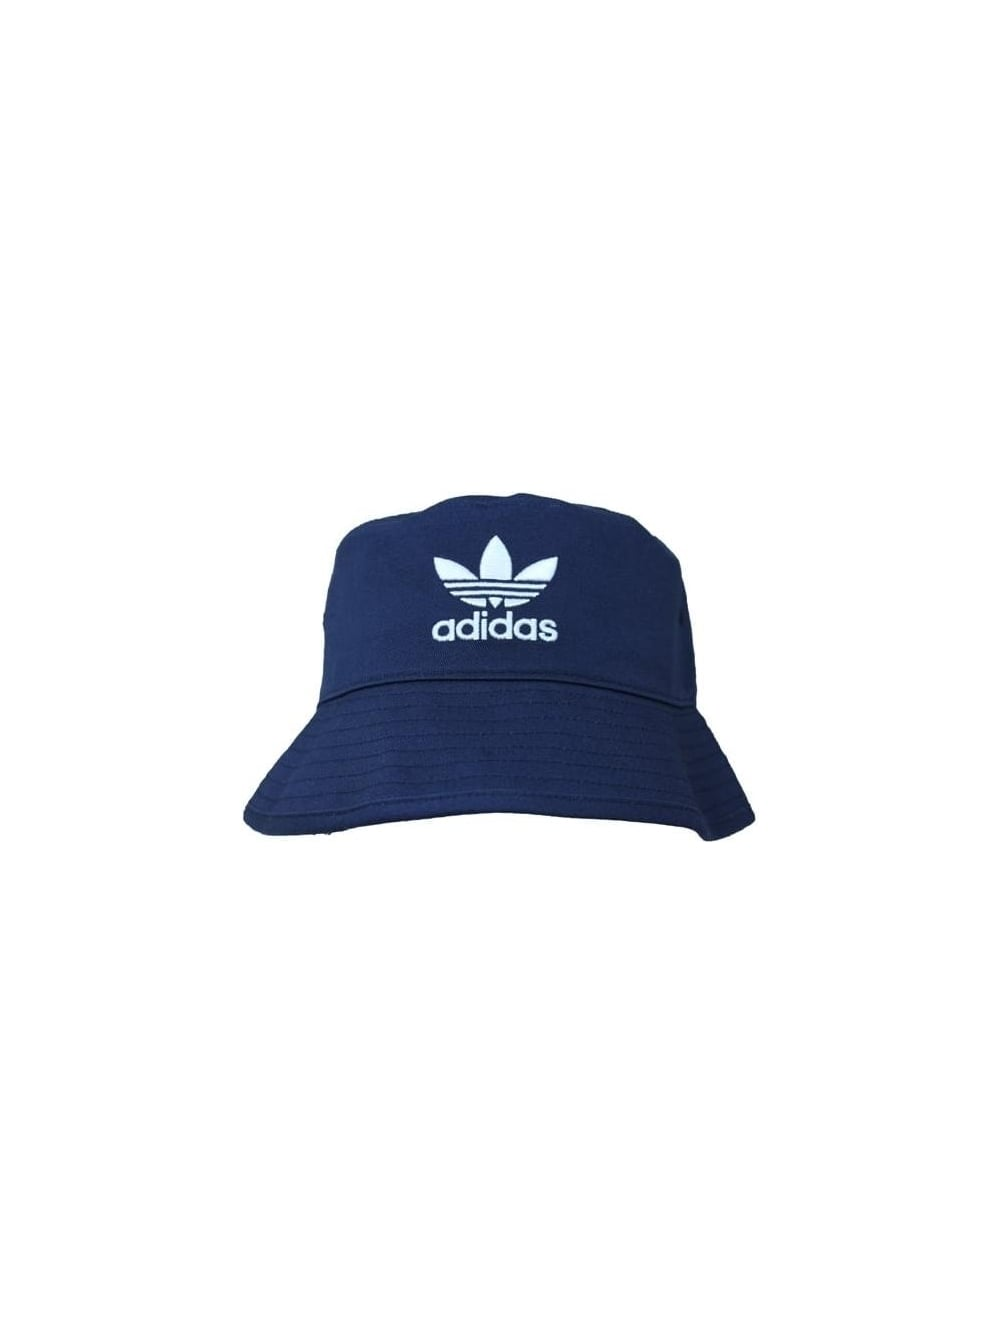 a68ccc294e1 adidas Originals AC Bucket Hat in Navy - Northern Threads